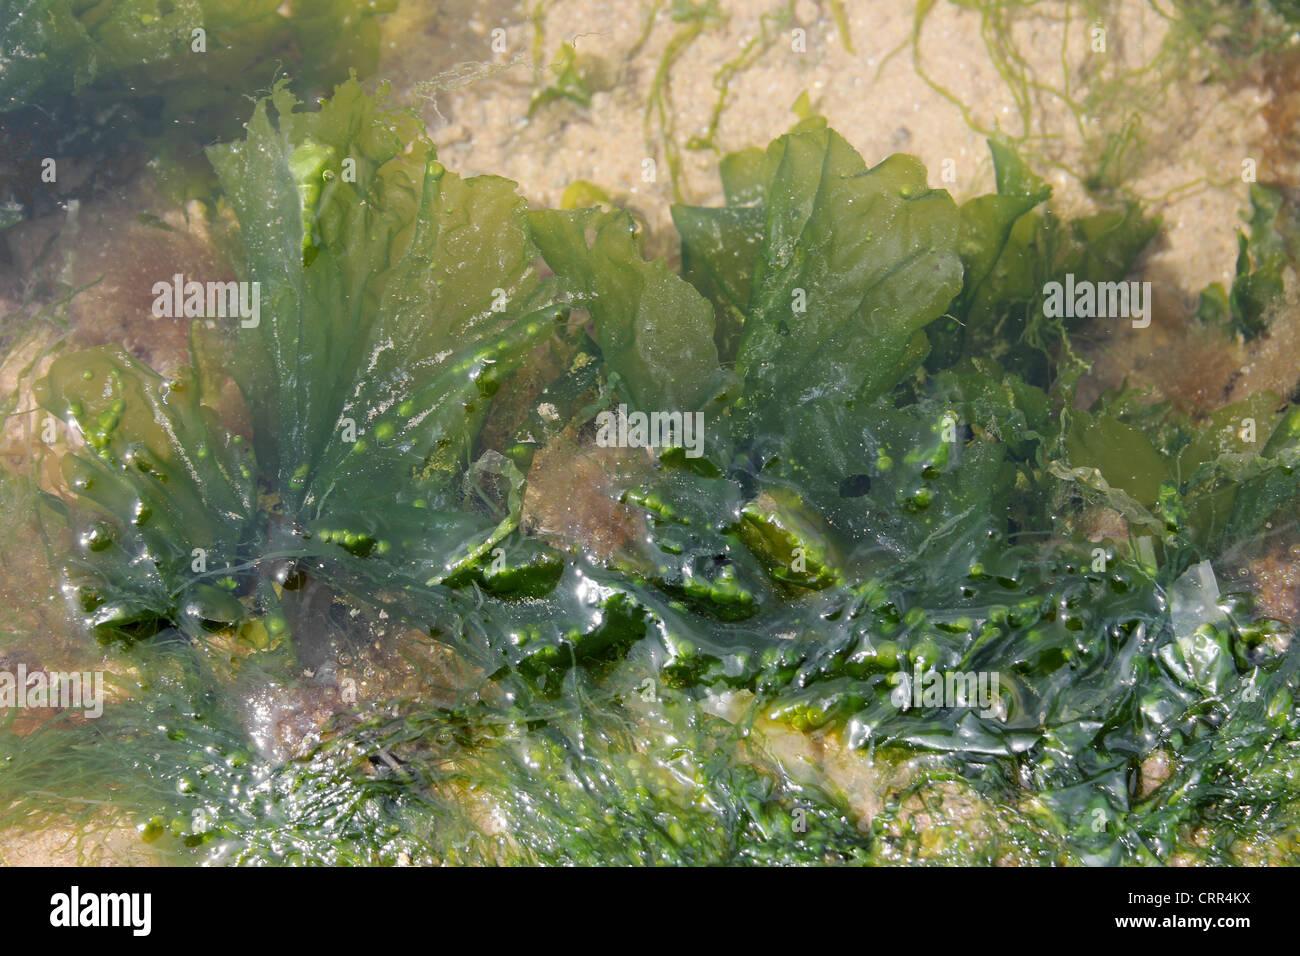 La lechuga de mar Ulva lactuca Foto de stock